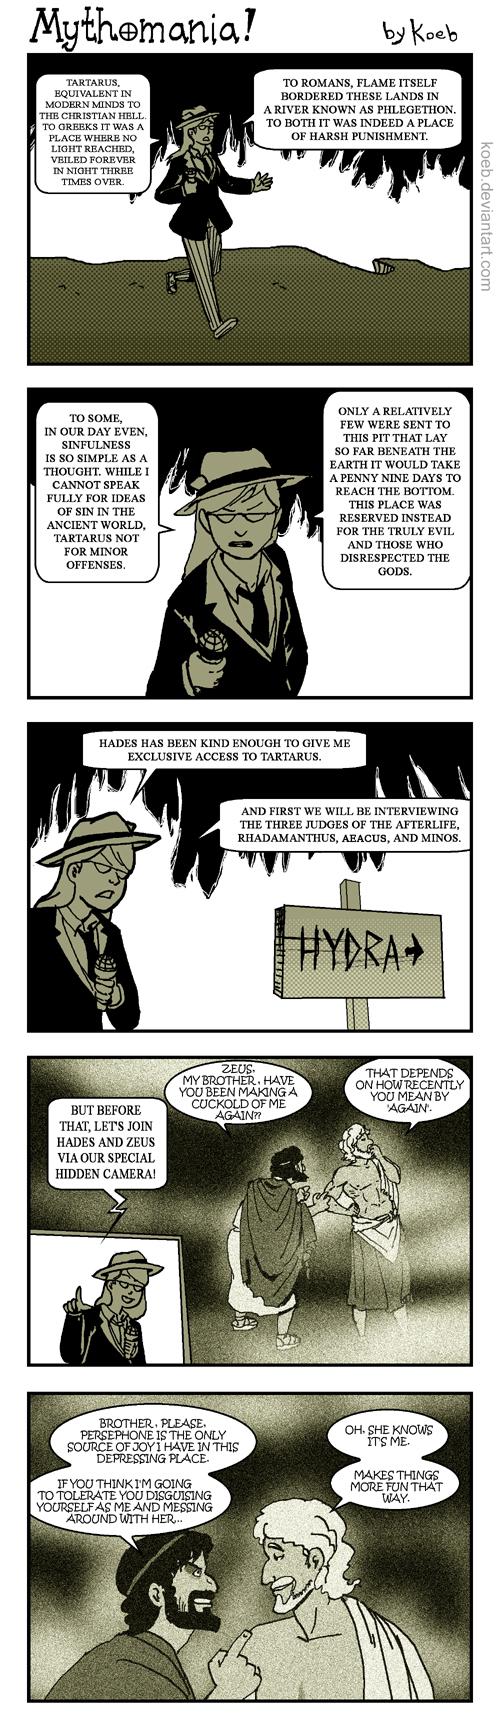 MYTHOMANIA: Tartarus sauce by koeb